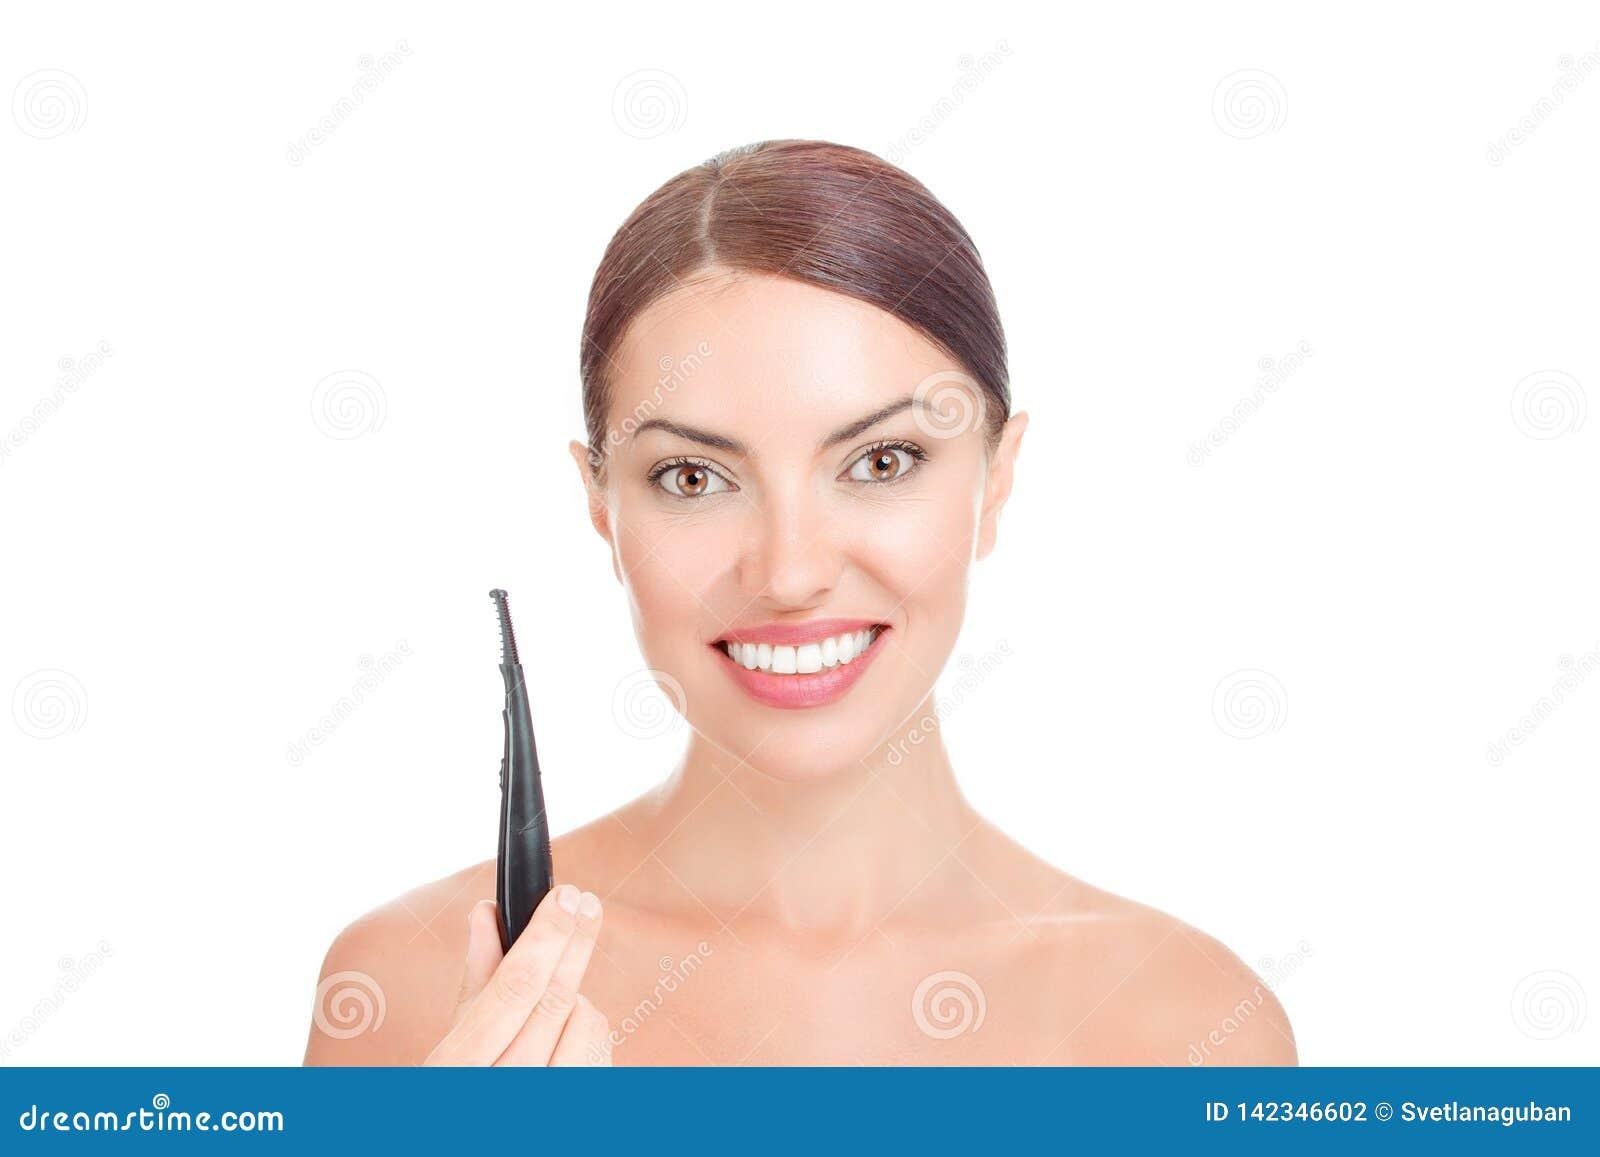 Beauty asian woman holding heated electric eyelash curler pen